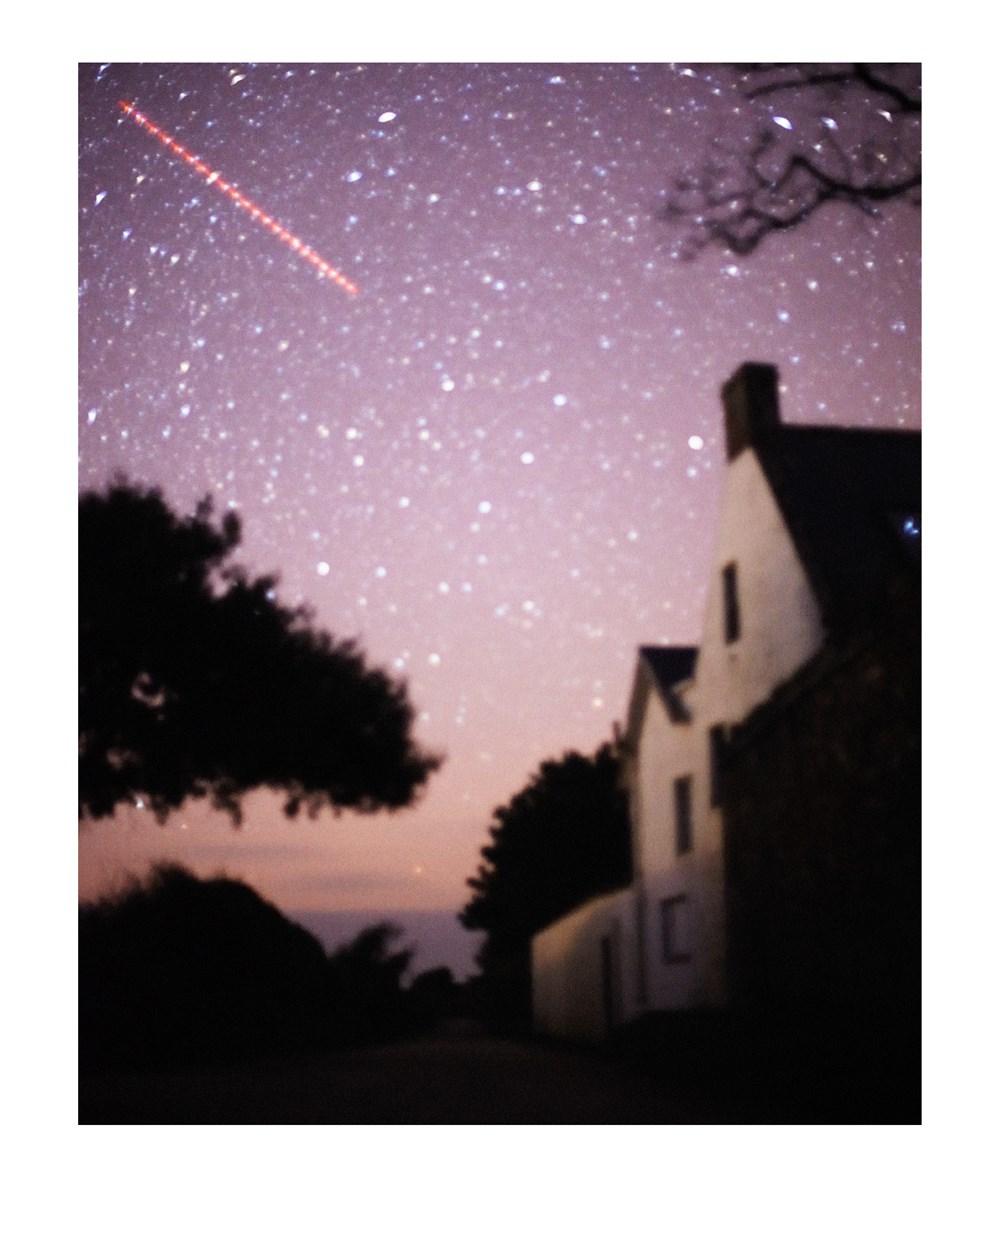 Future Dreams - Lot 7, Chris Floyd, A Starry Night On Sark